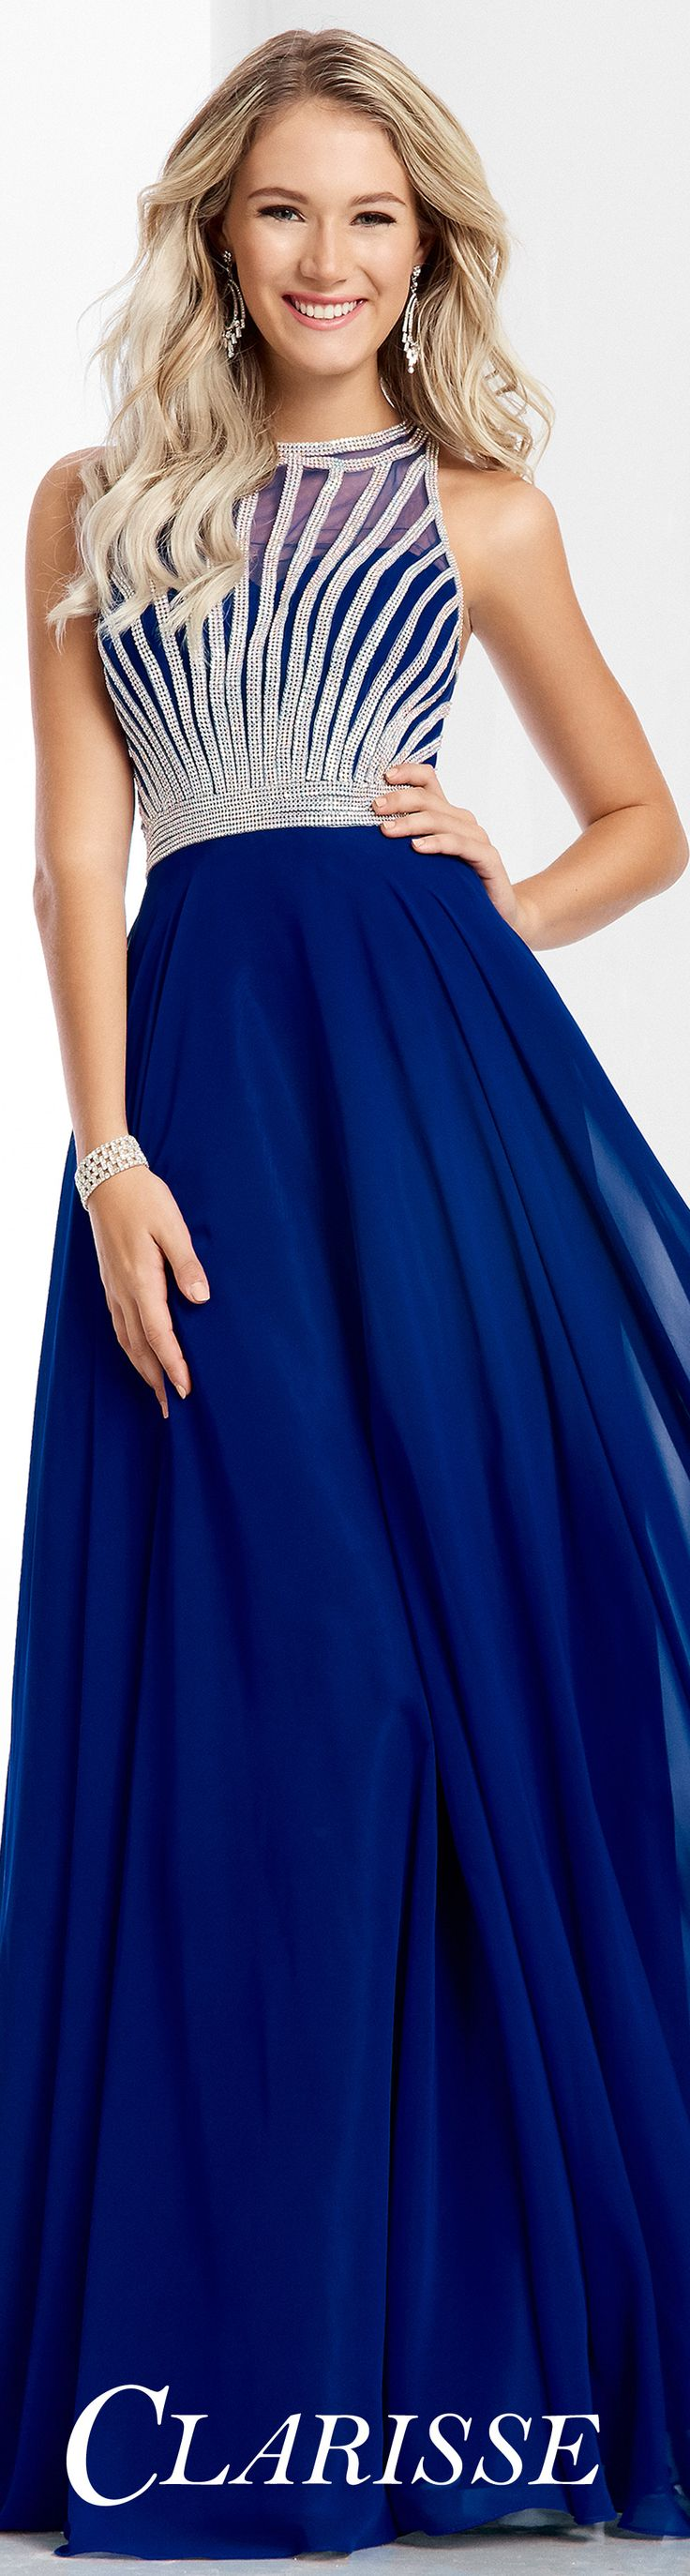 185 best a bronze 4 prom images on pinterest formal prom dresses